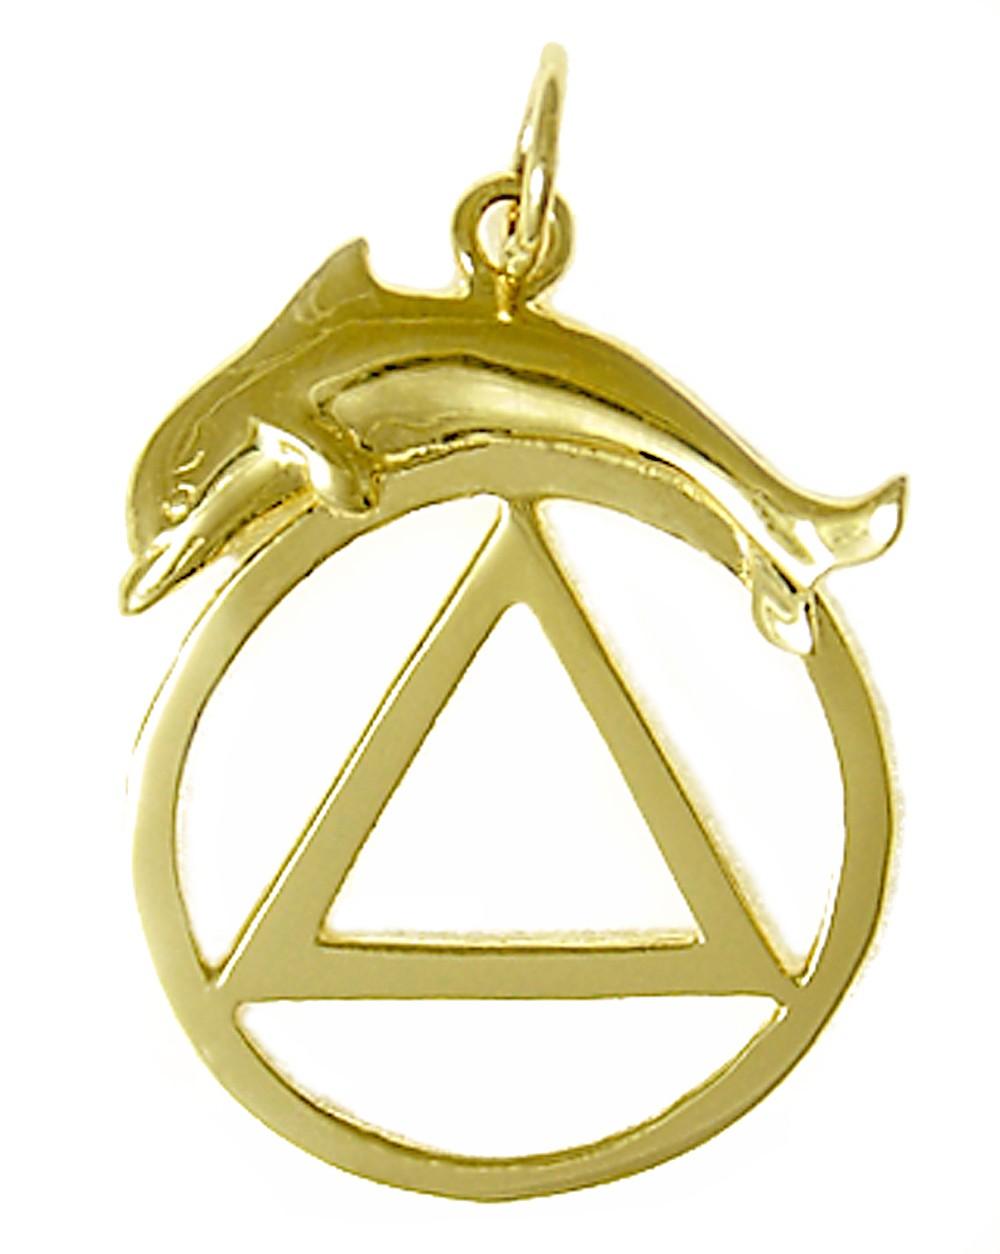 Gold dolphin pendant alcoholics anonymous pendant 14k gold aa symbol wdolphin pendant 14kaasymbledolphinpendantg aloadofball Gallery